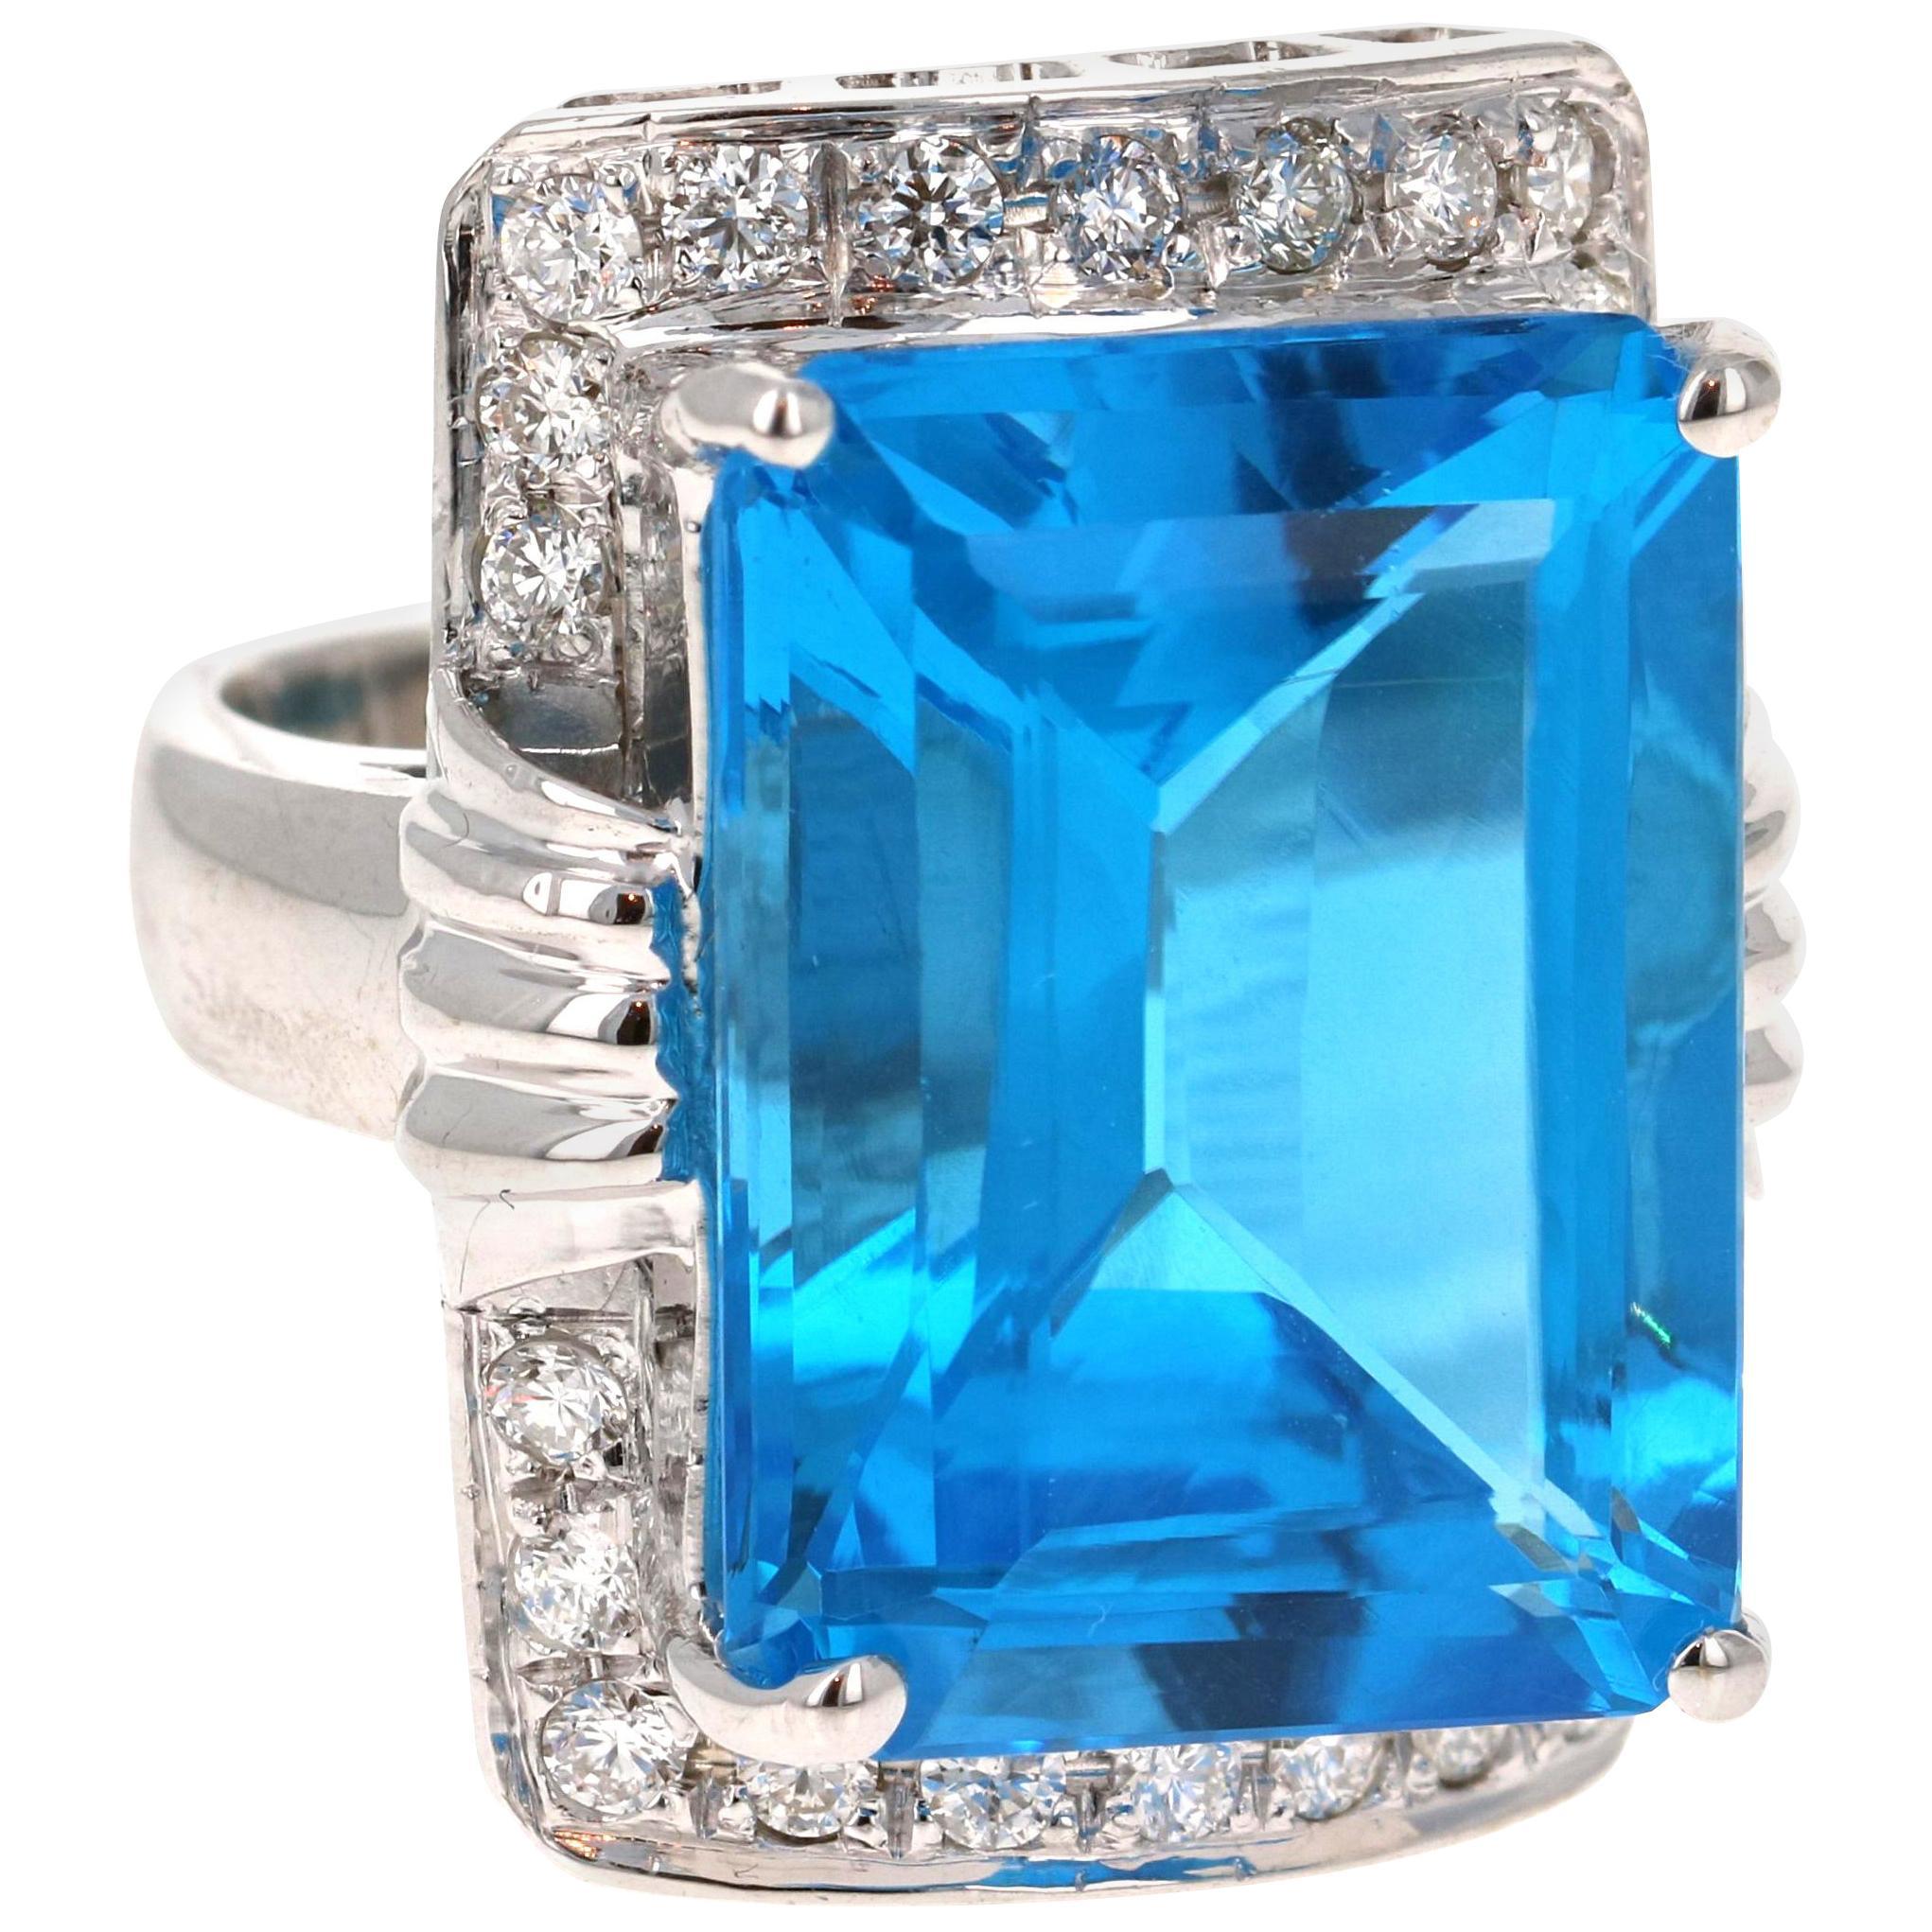 26.07 Carat Emerald Cut Blue Topaz Diamond 14 Karat White Gold Cocktail Ring